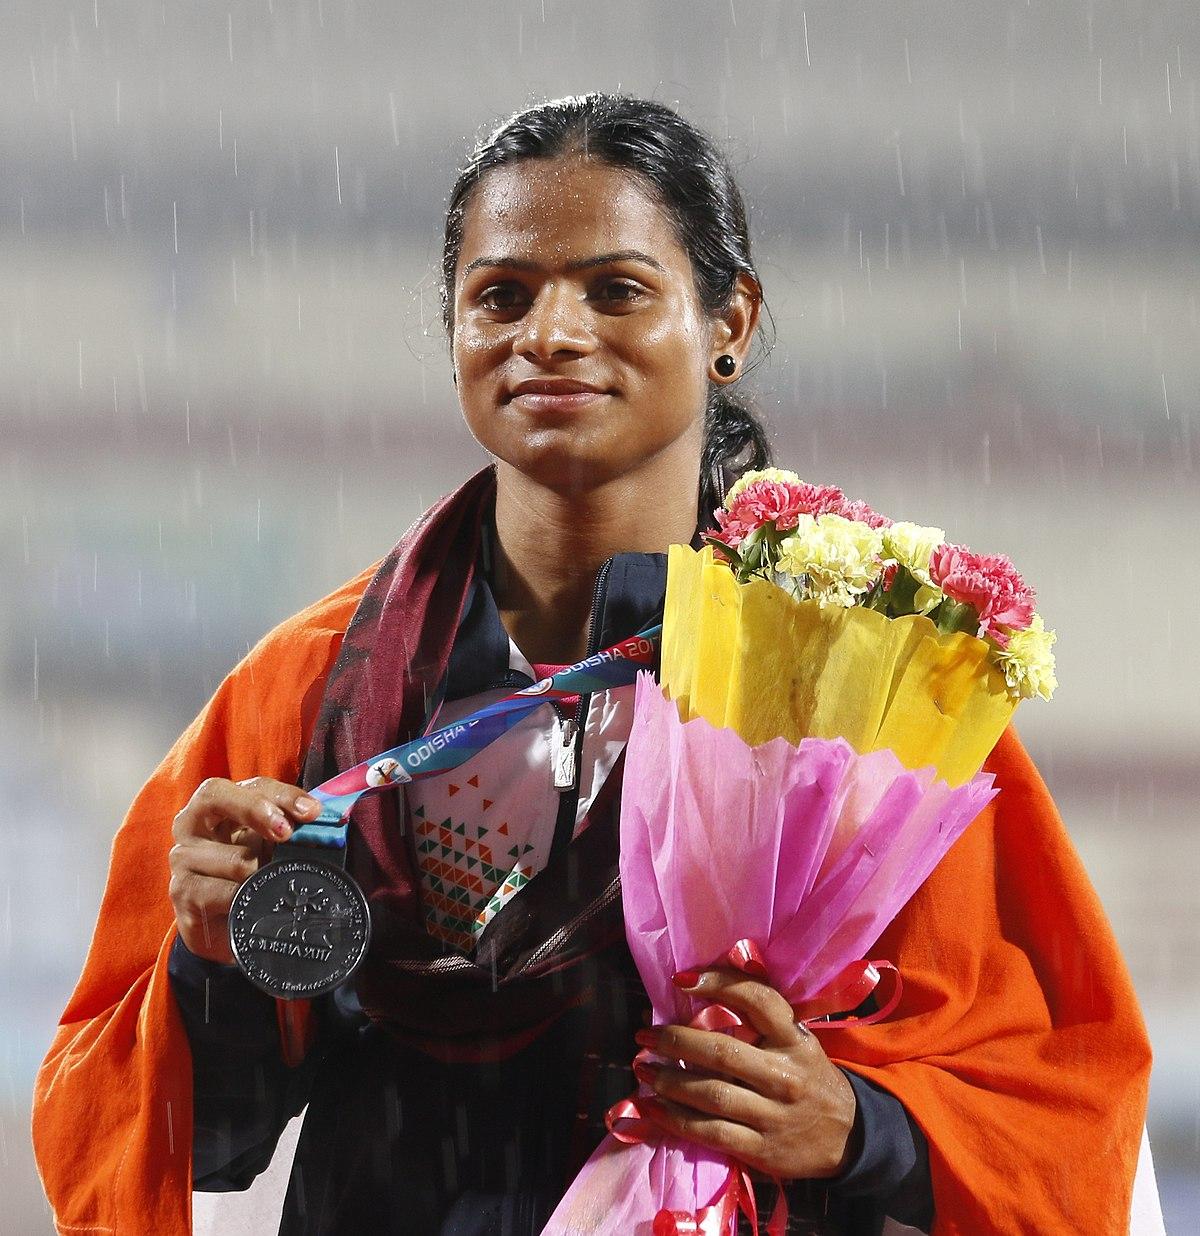 bengali speed dating london 2015 olympics